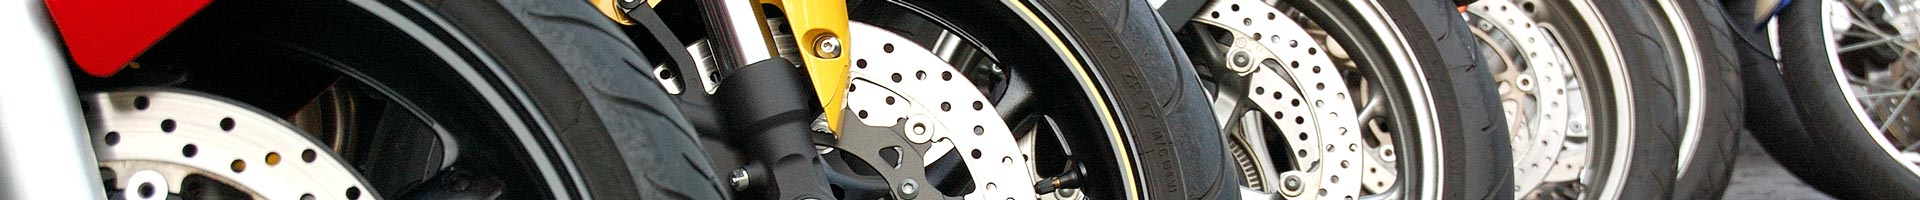 Přeprava motocyklů  efc704385d